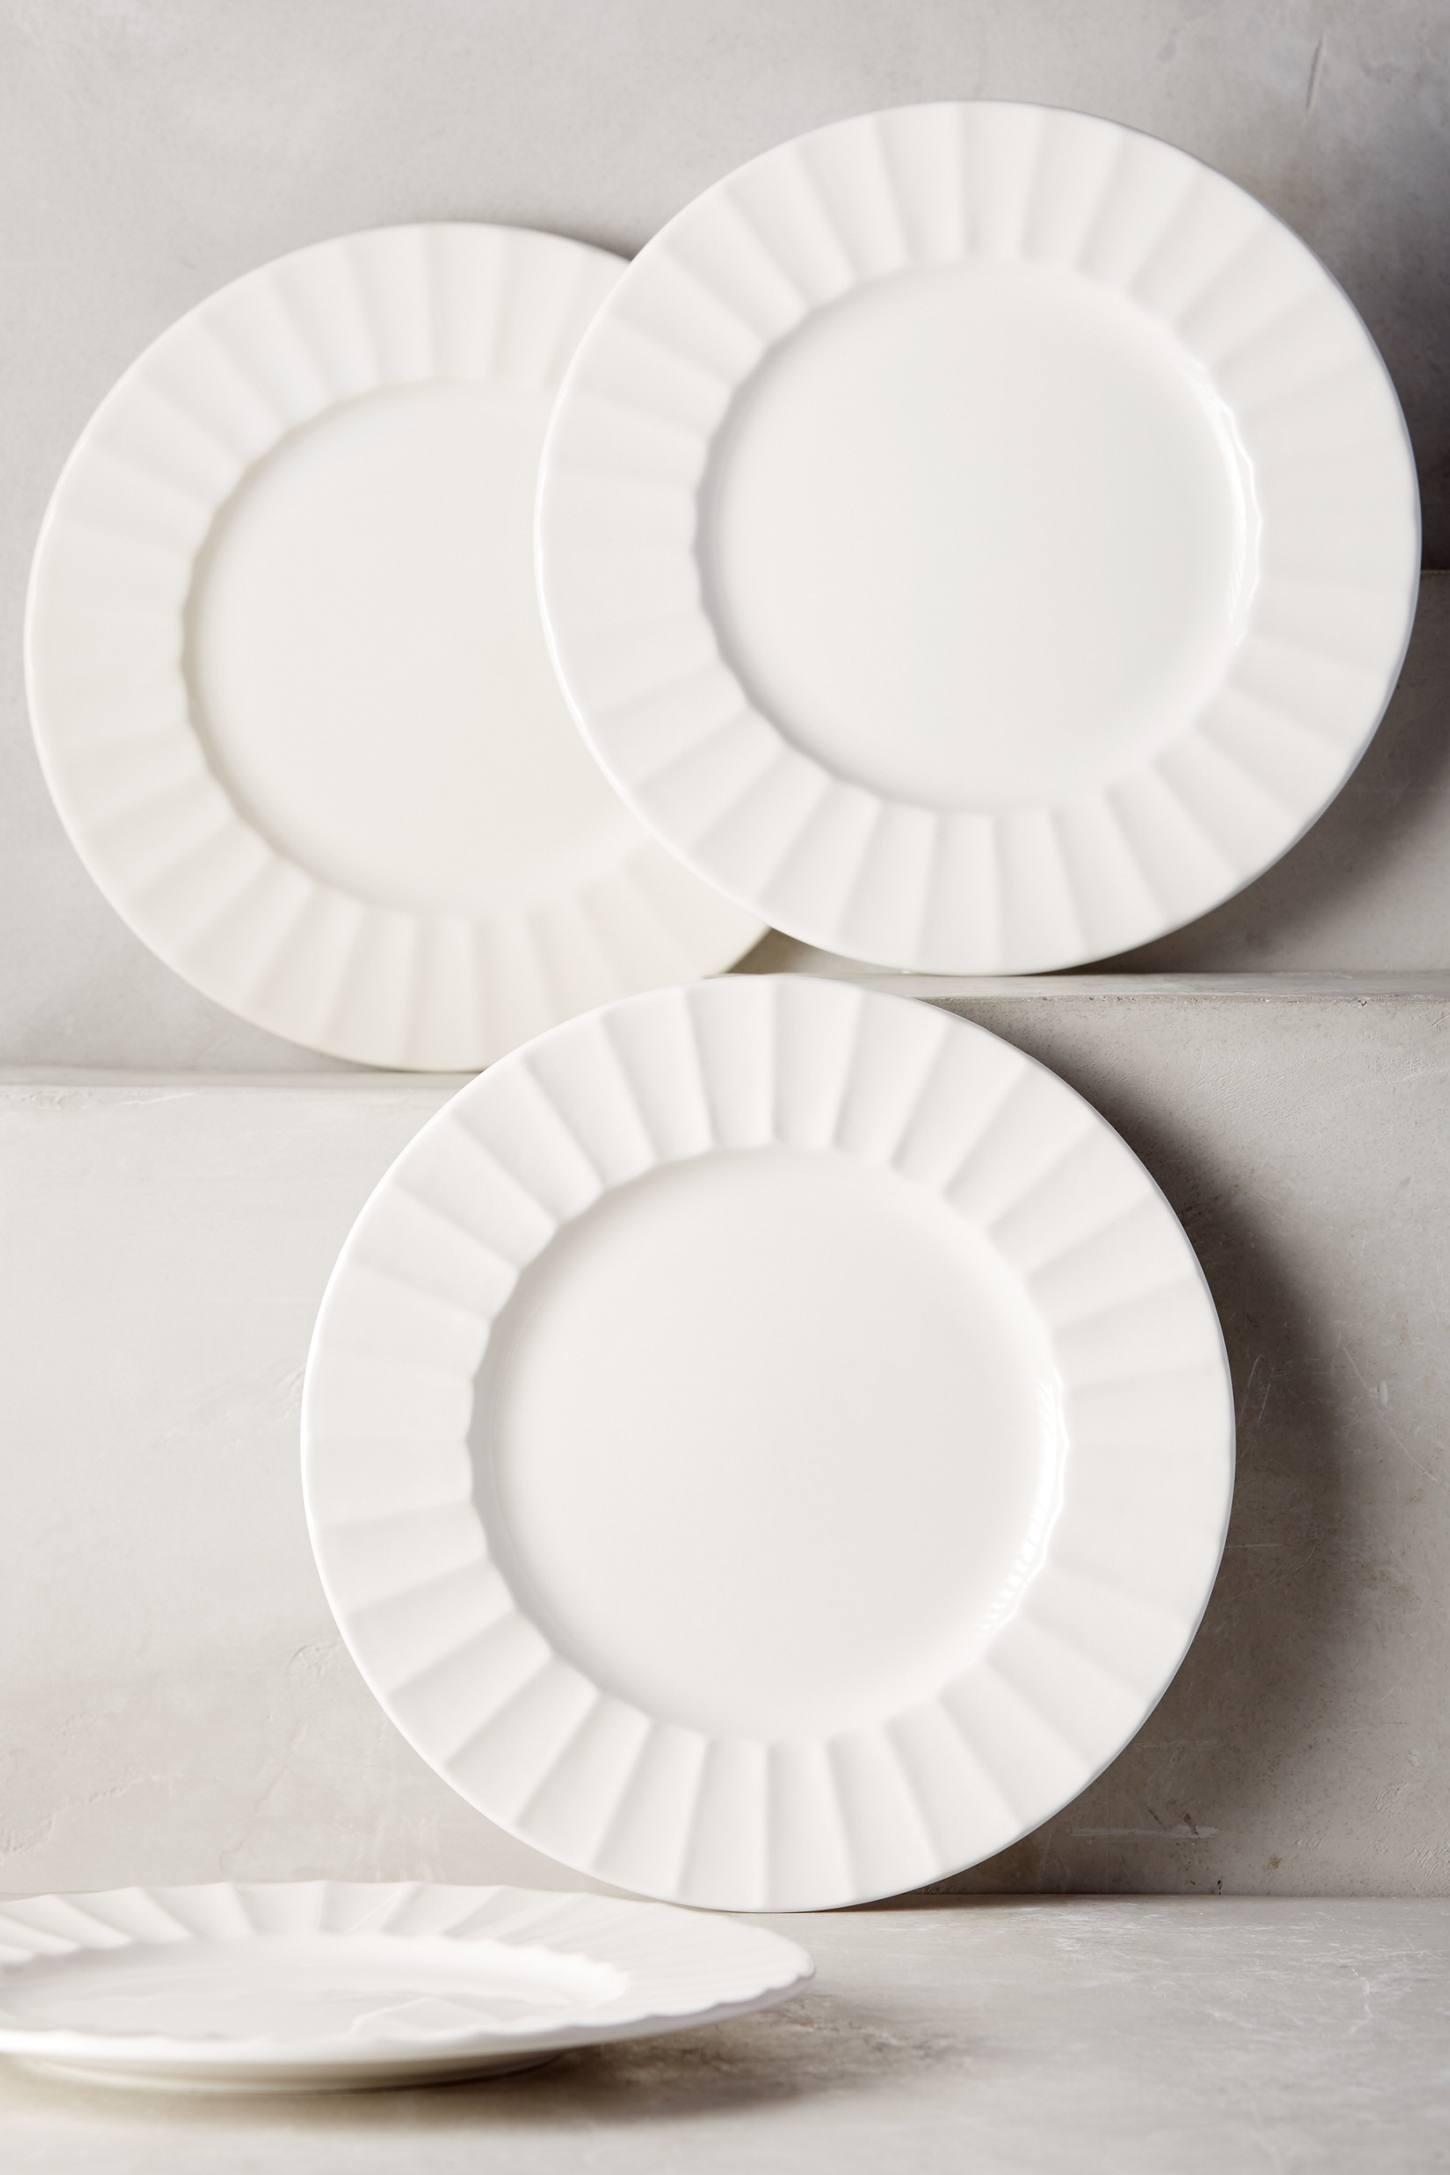 Walker mcewan and anthony cervo wedding registry amazon latte dinner plate set anthropologie junglespirit Gallery